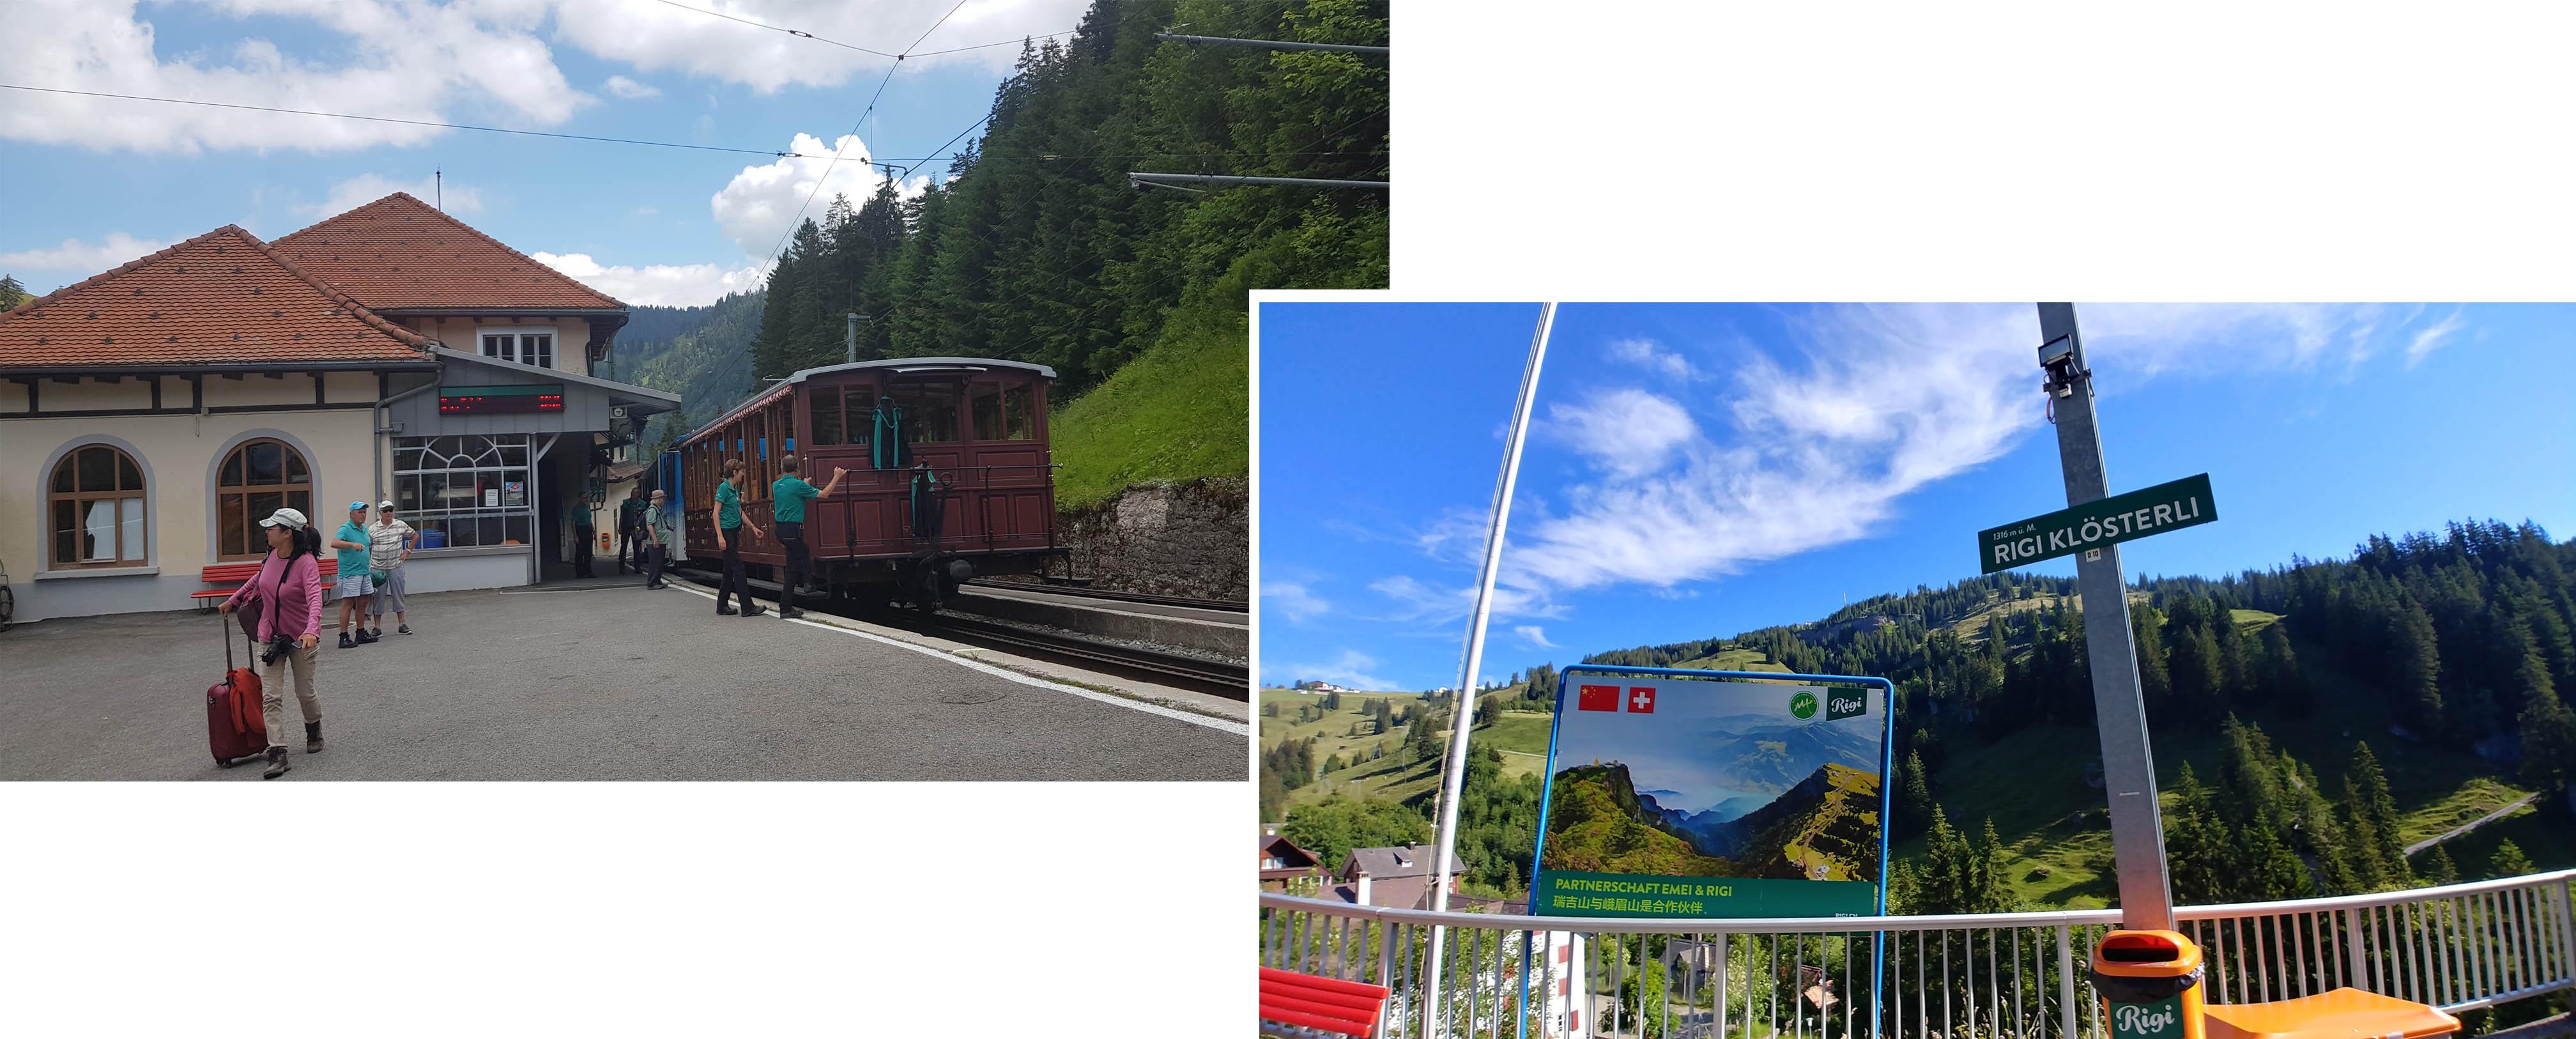 Rigi Klosteri Station